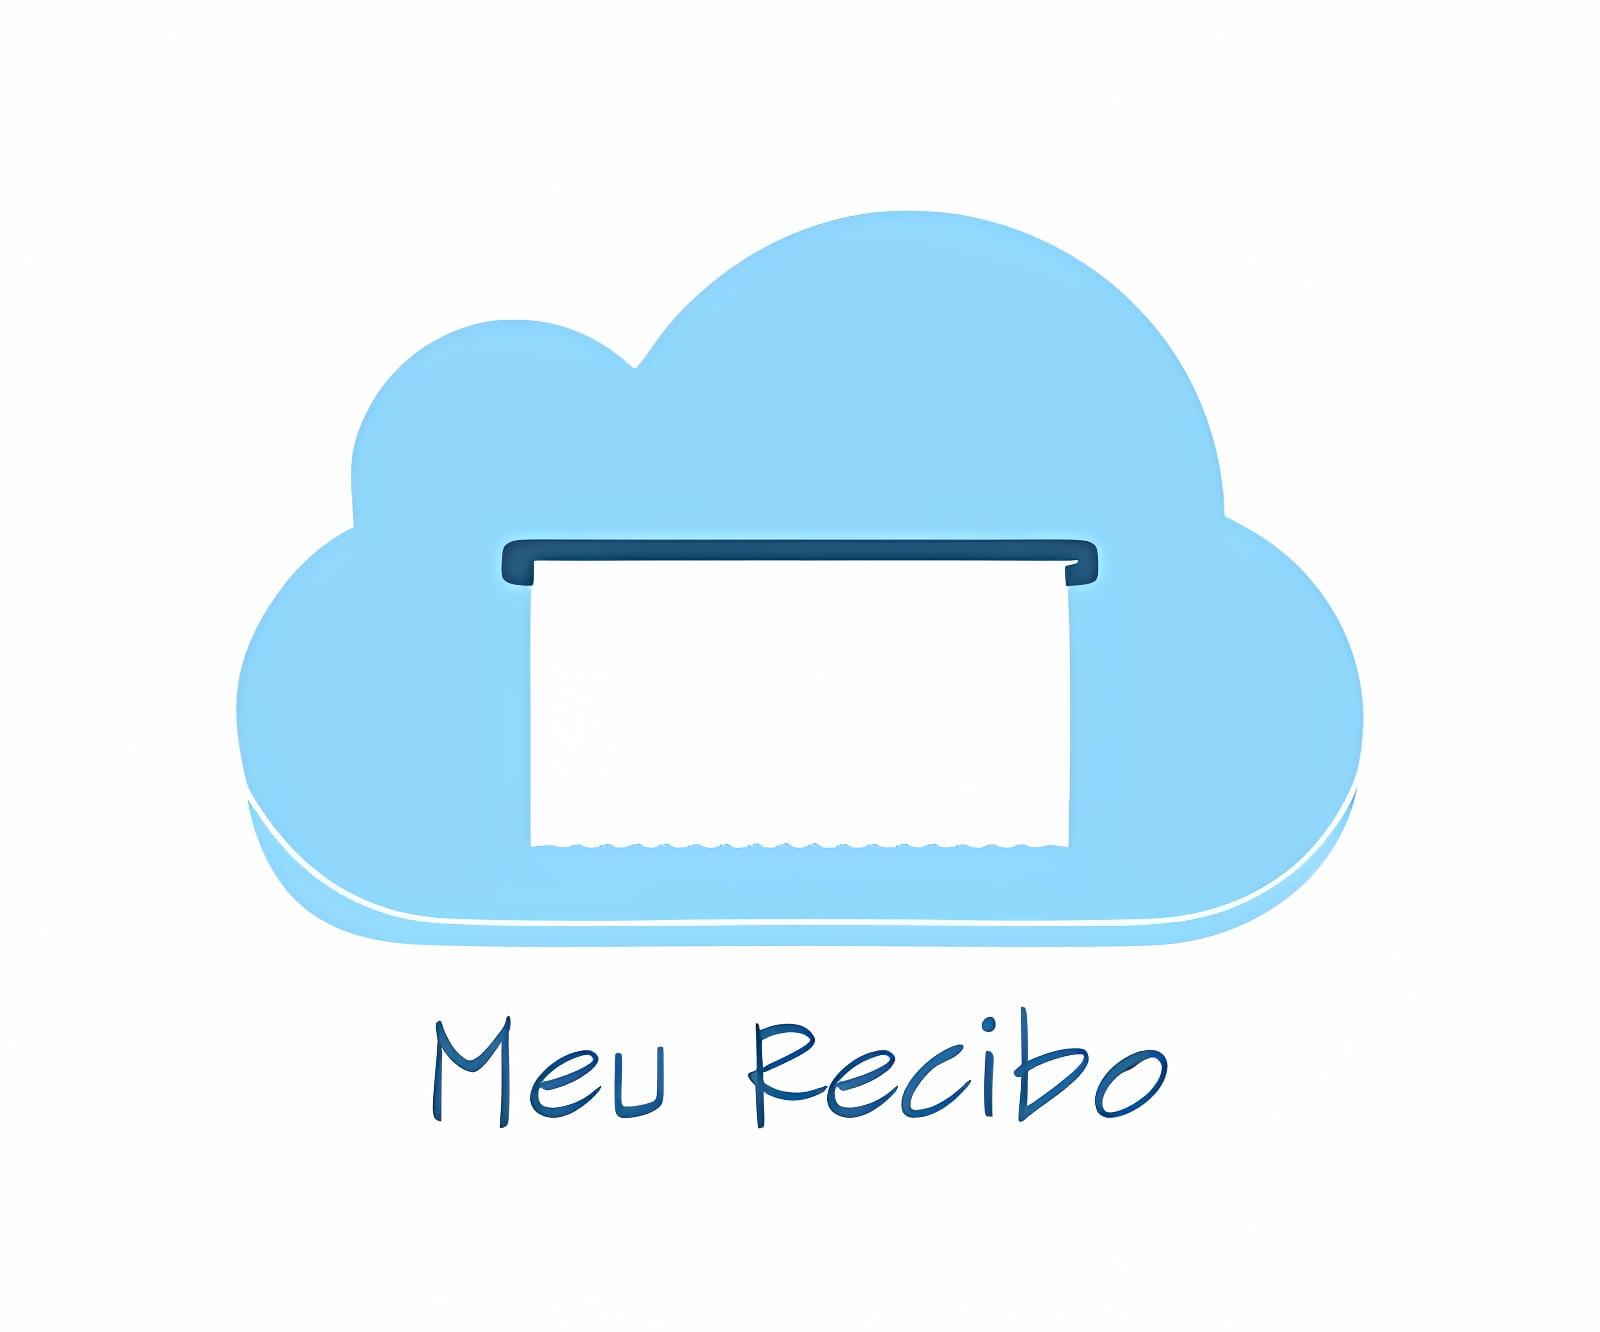 Meu Recibo 1.2